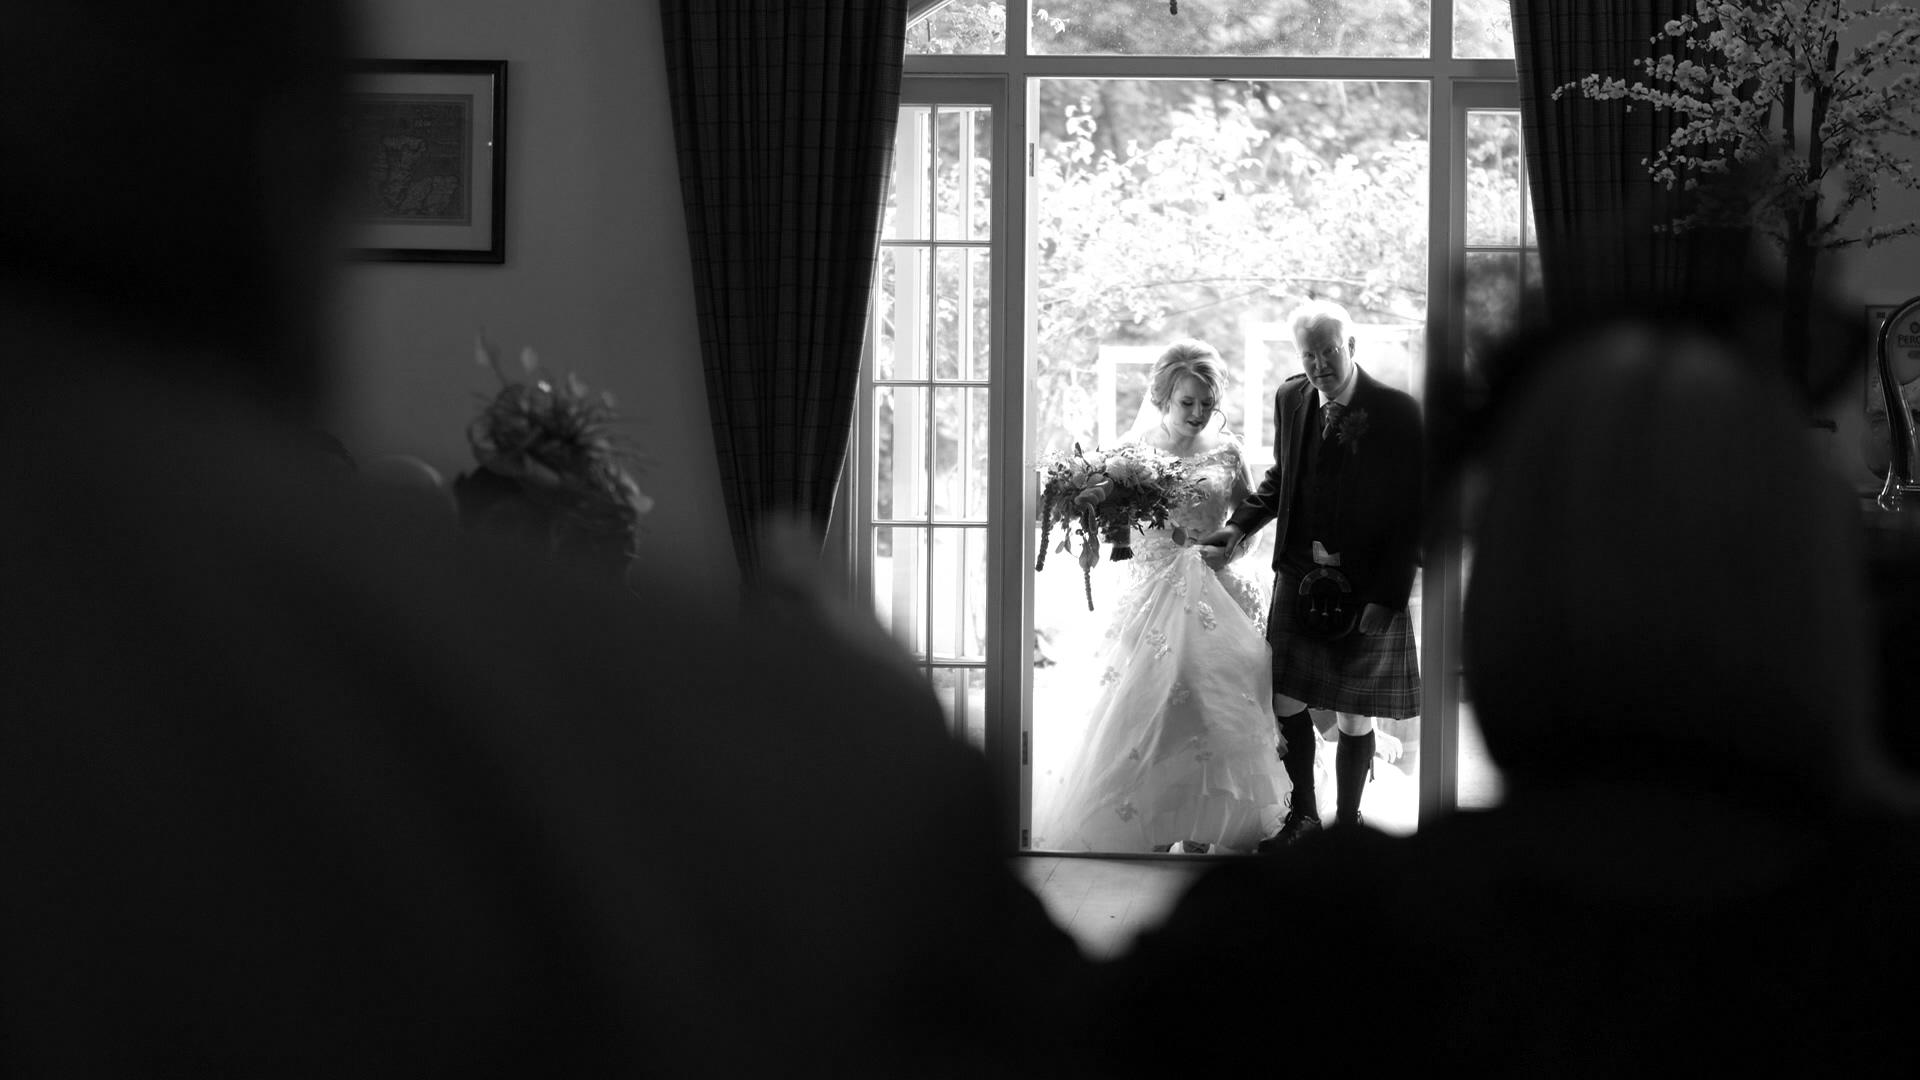 ASWANLEY-SUMMER-WEDDING (07).jpg